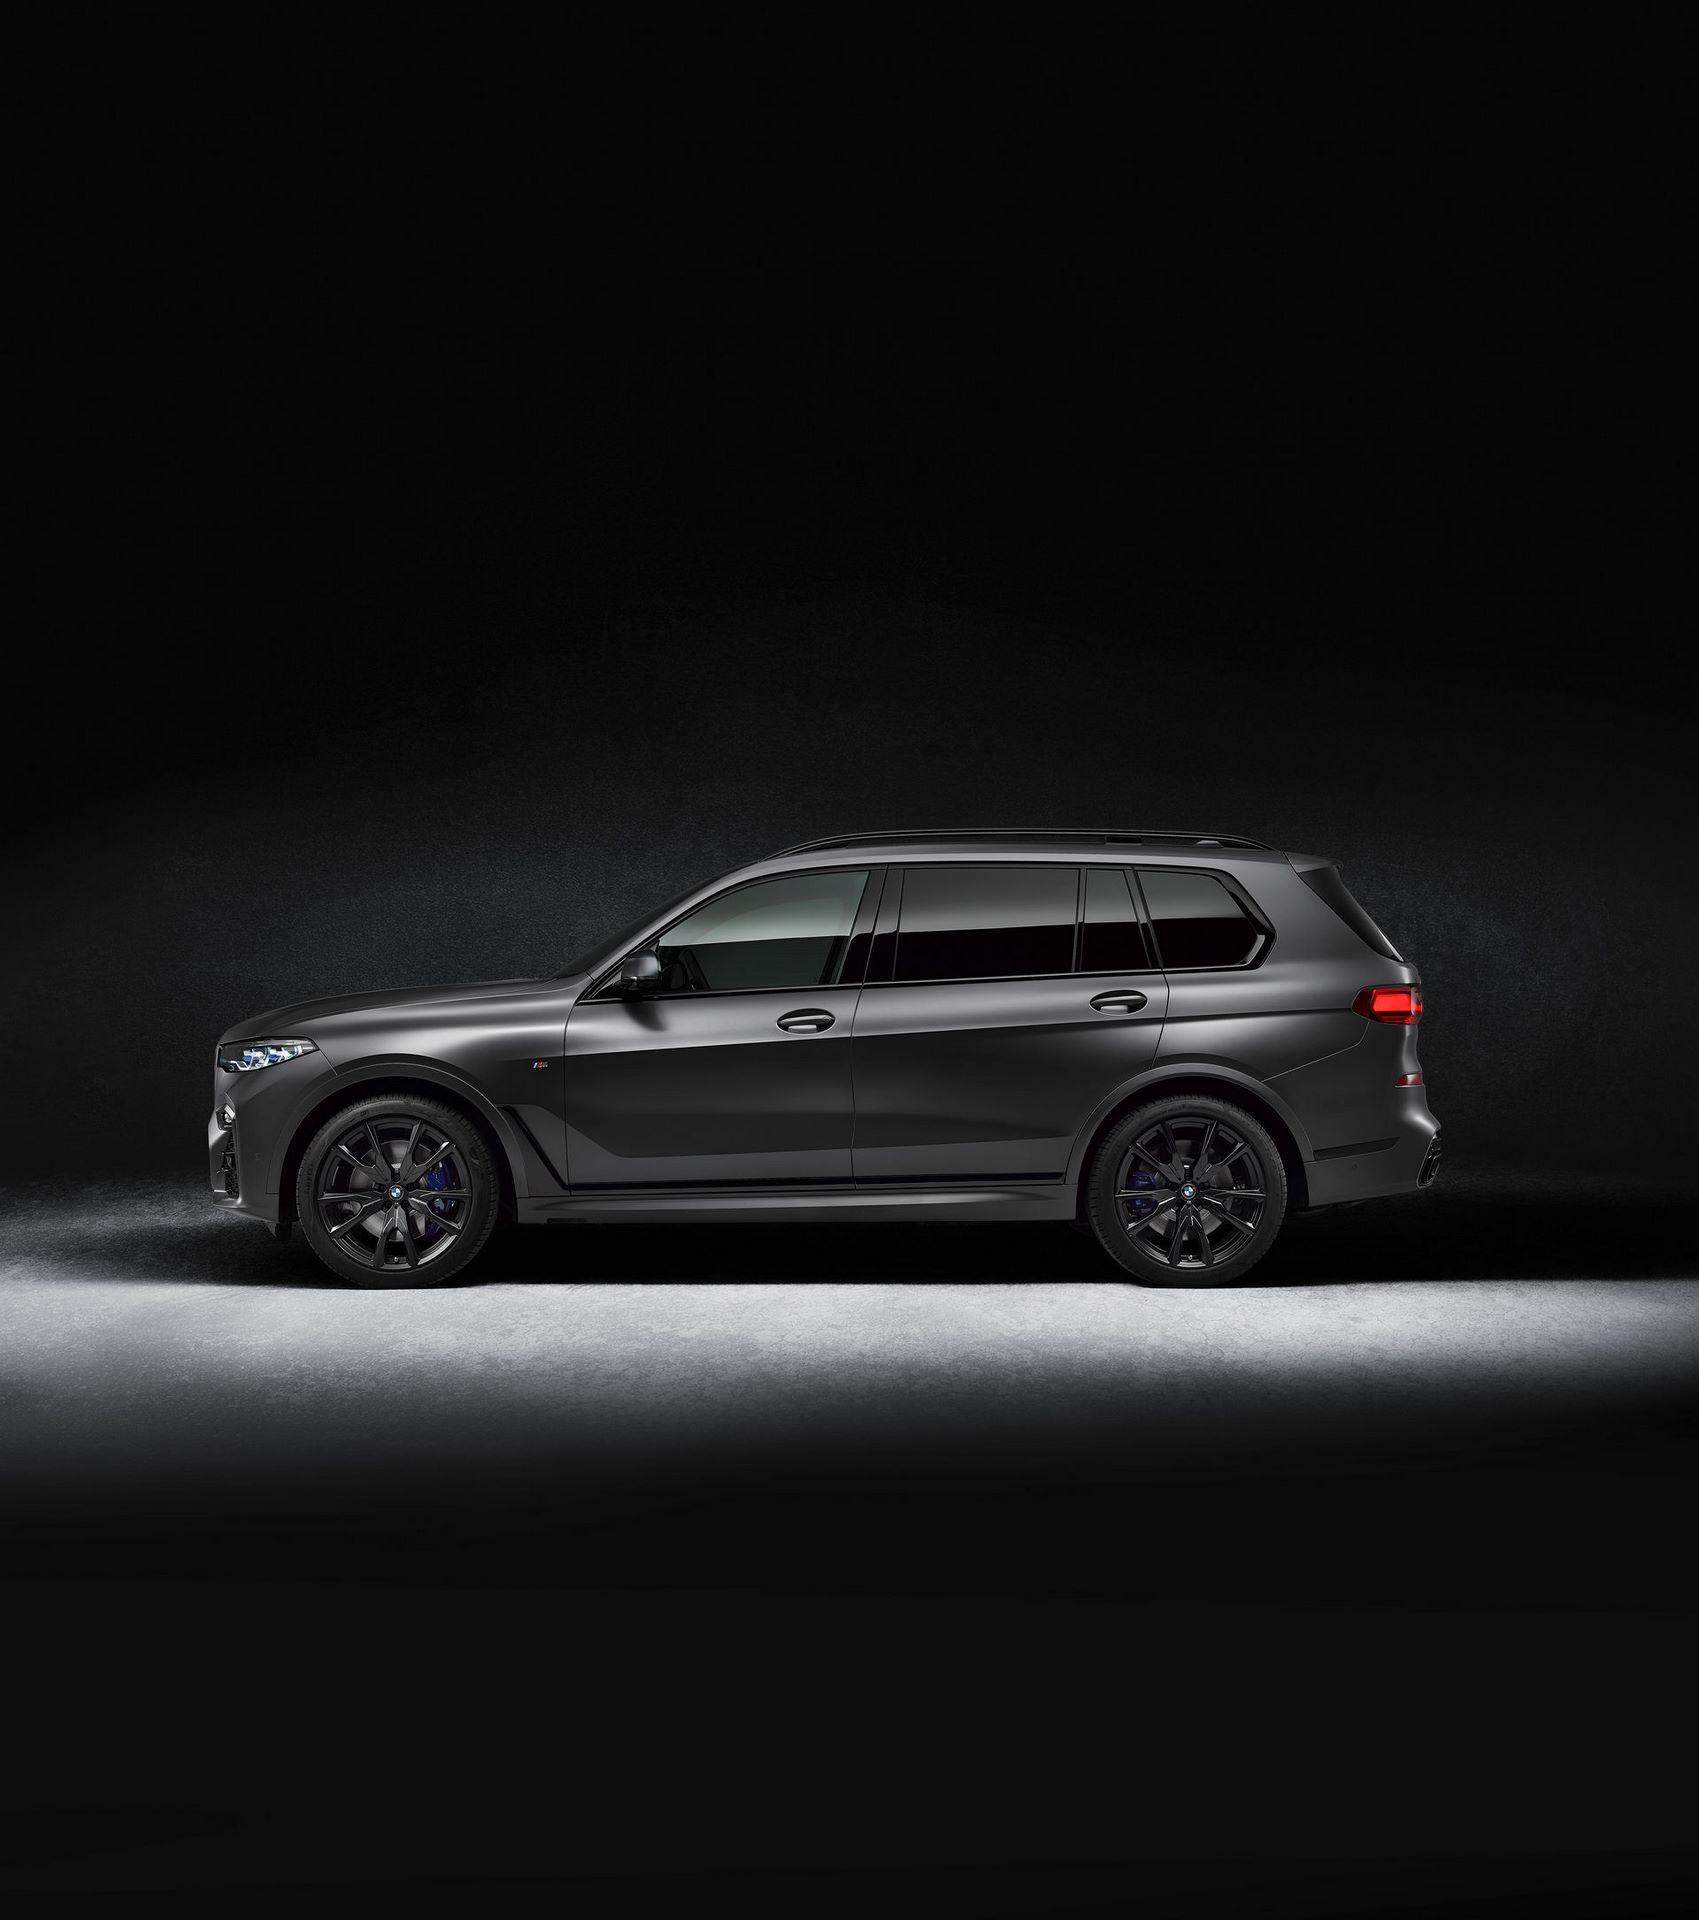 BMW-X7-Dark-Shadow-Edition-12